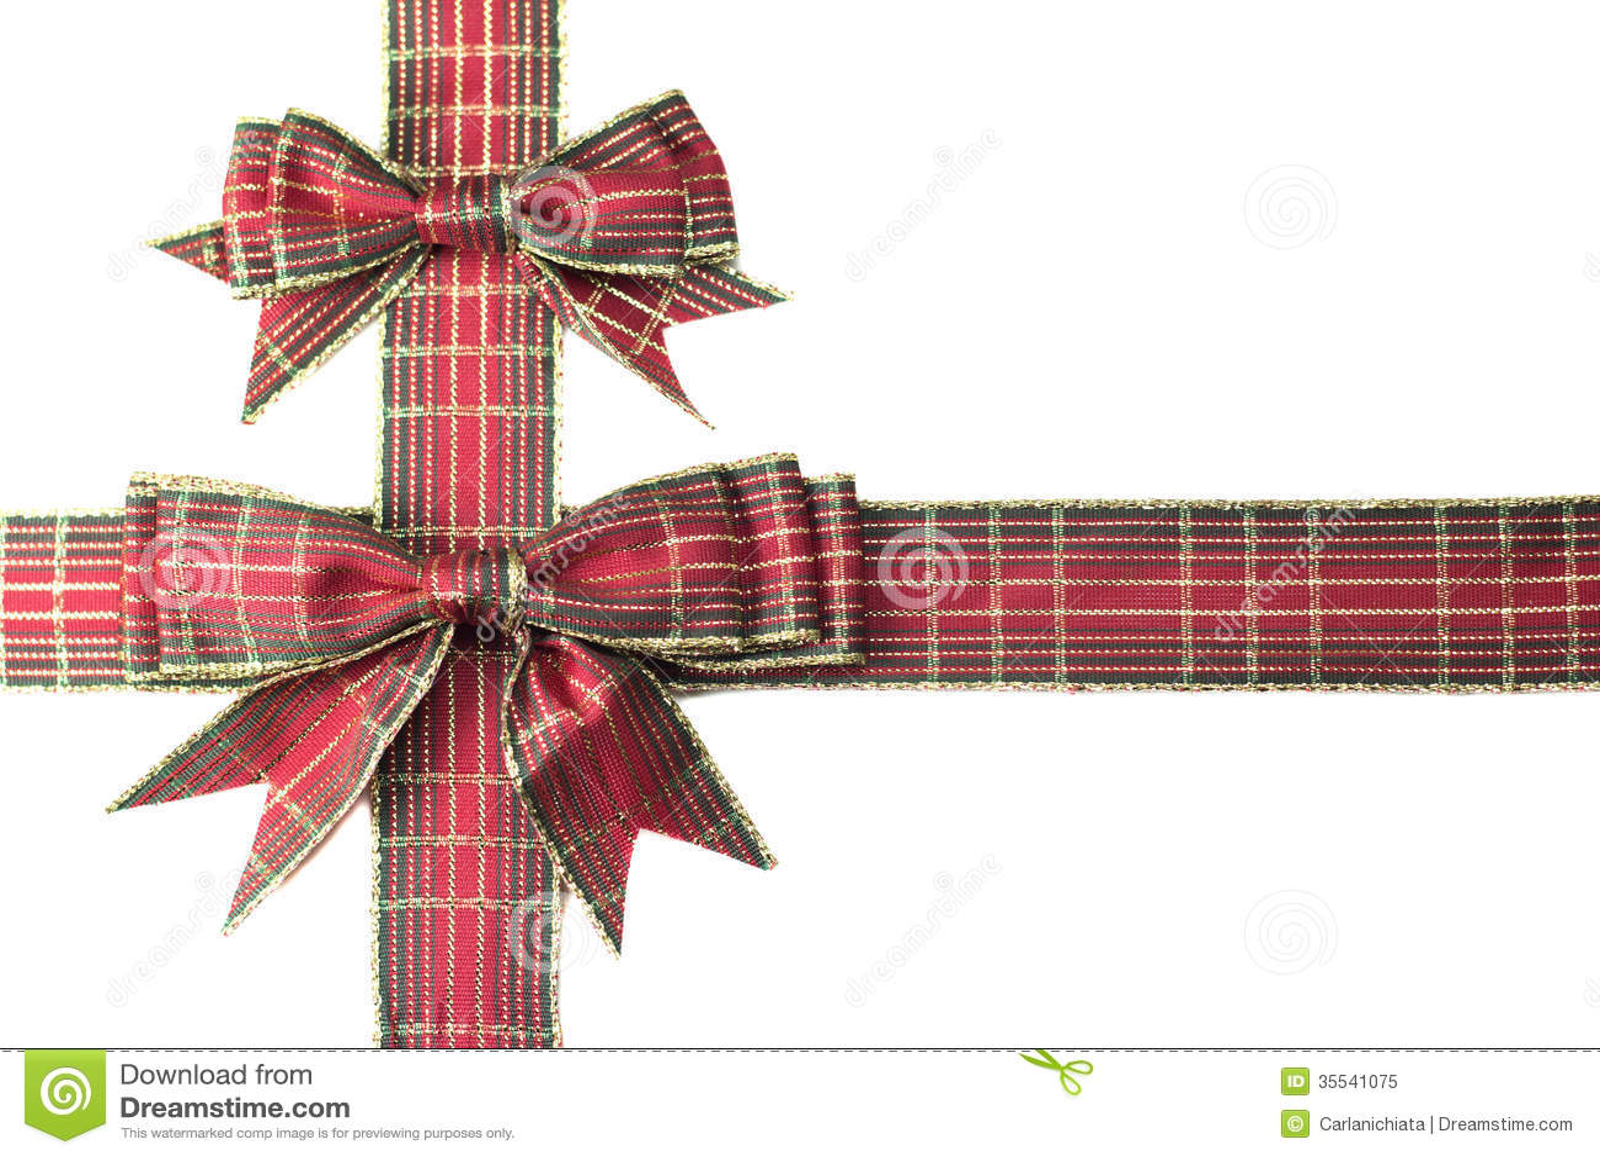 Gift Ribbon Royalty Free Stock Photo Image 35541075